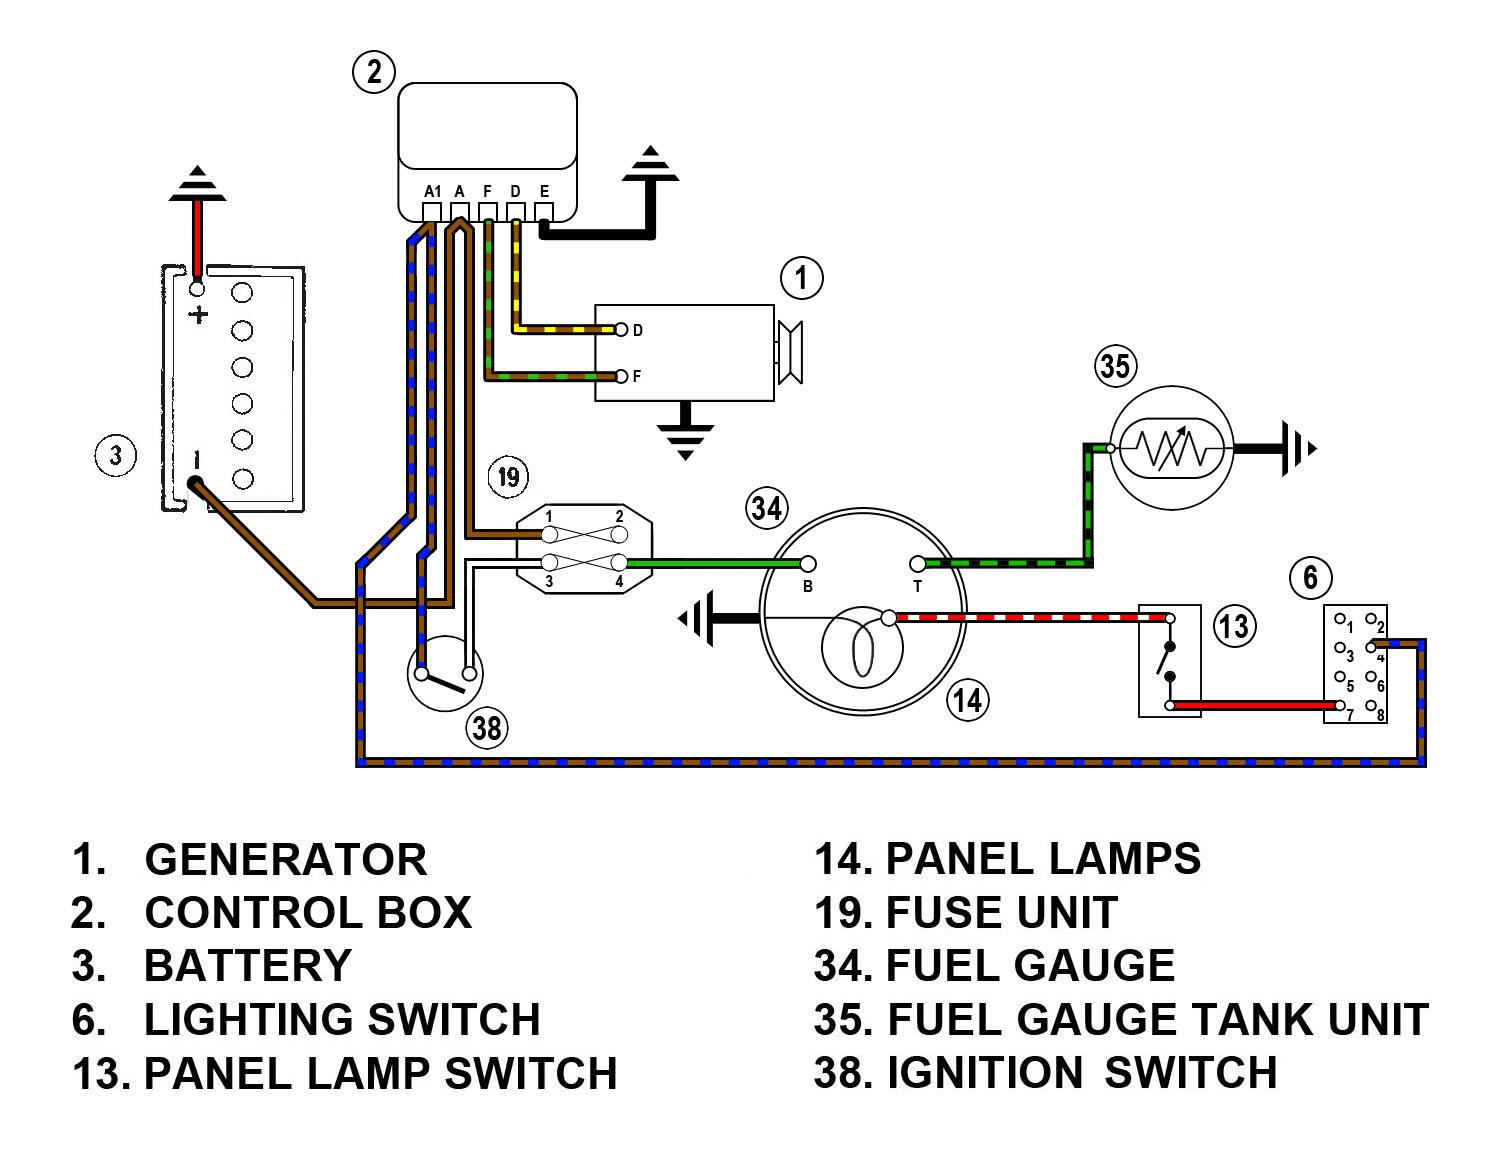 honeywell burglar alarm wiring diagram trailer plug uk generator library